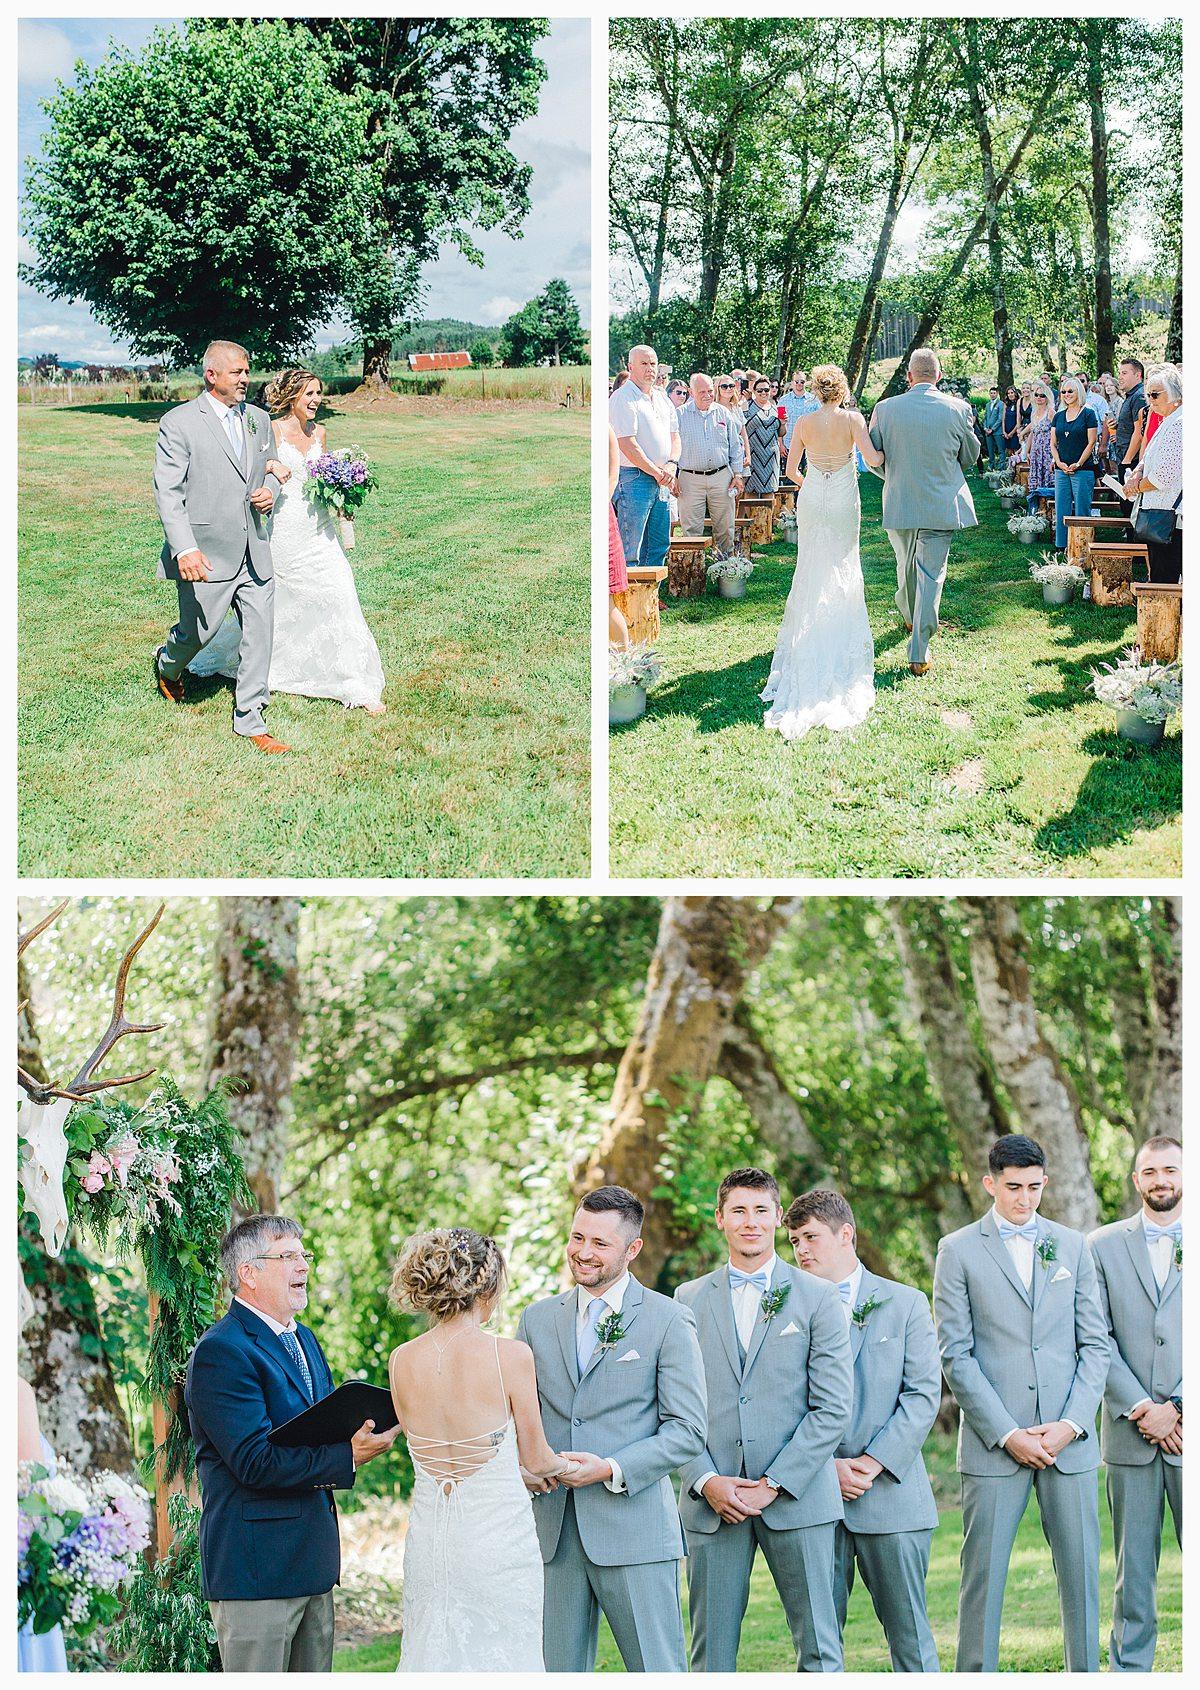 Rustic Coastal Blue Wedding in Southwest Washington, Emma Rose Company, Seattle and Portland Wedding Photographer, Light and Airy_0119.jpg